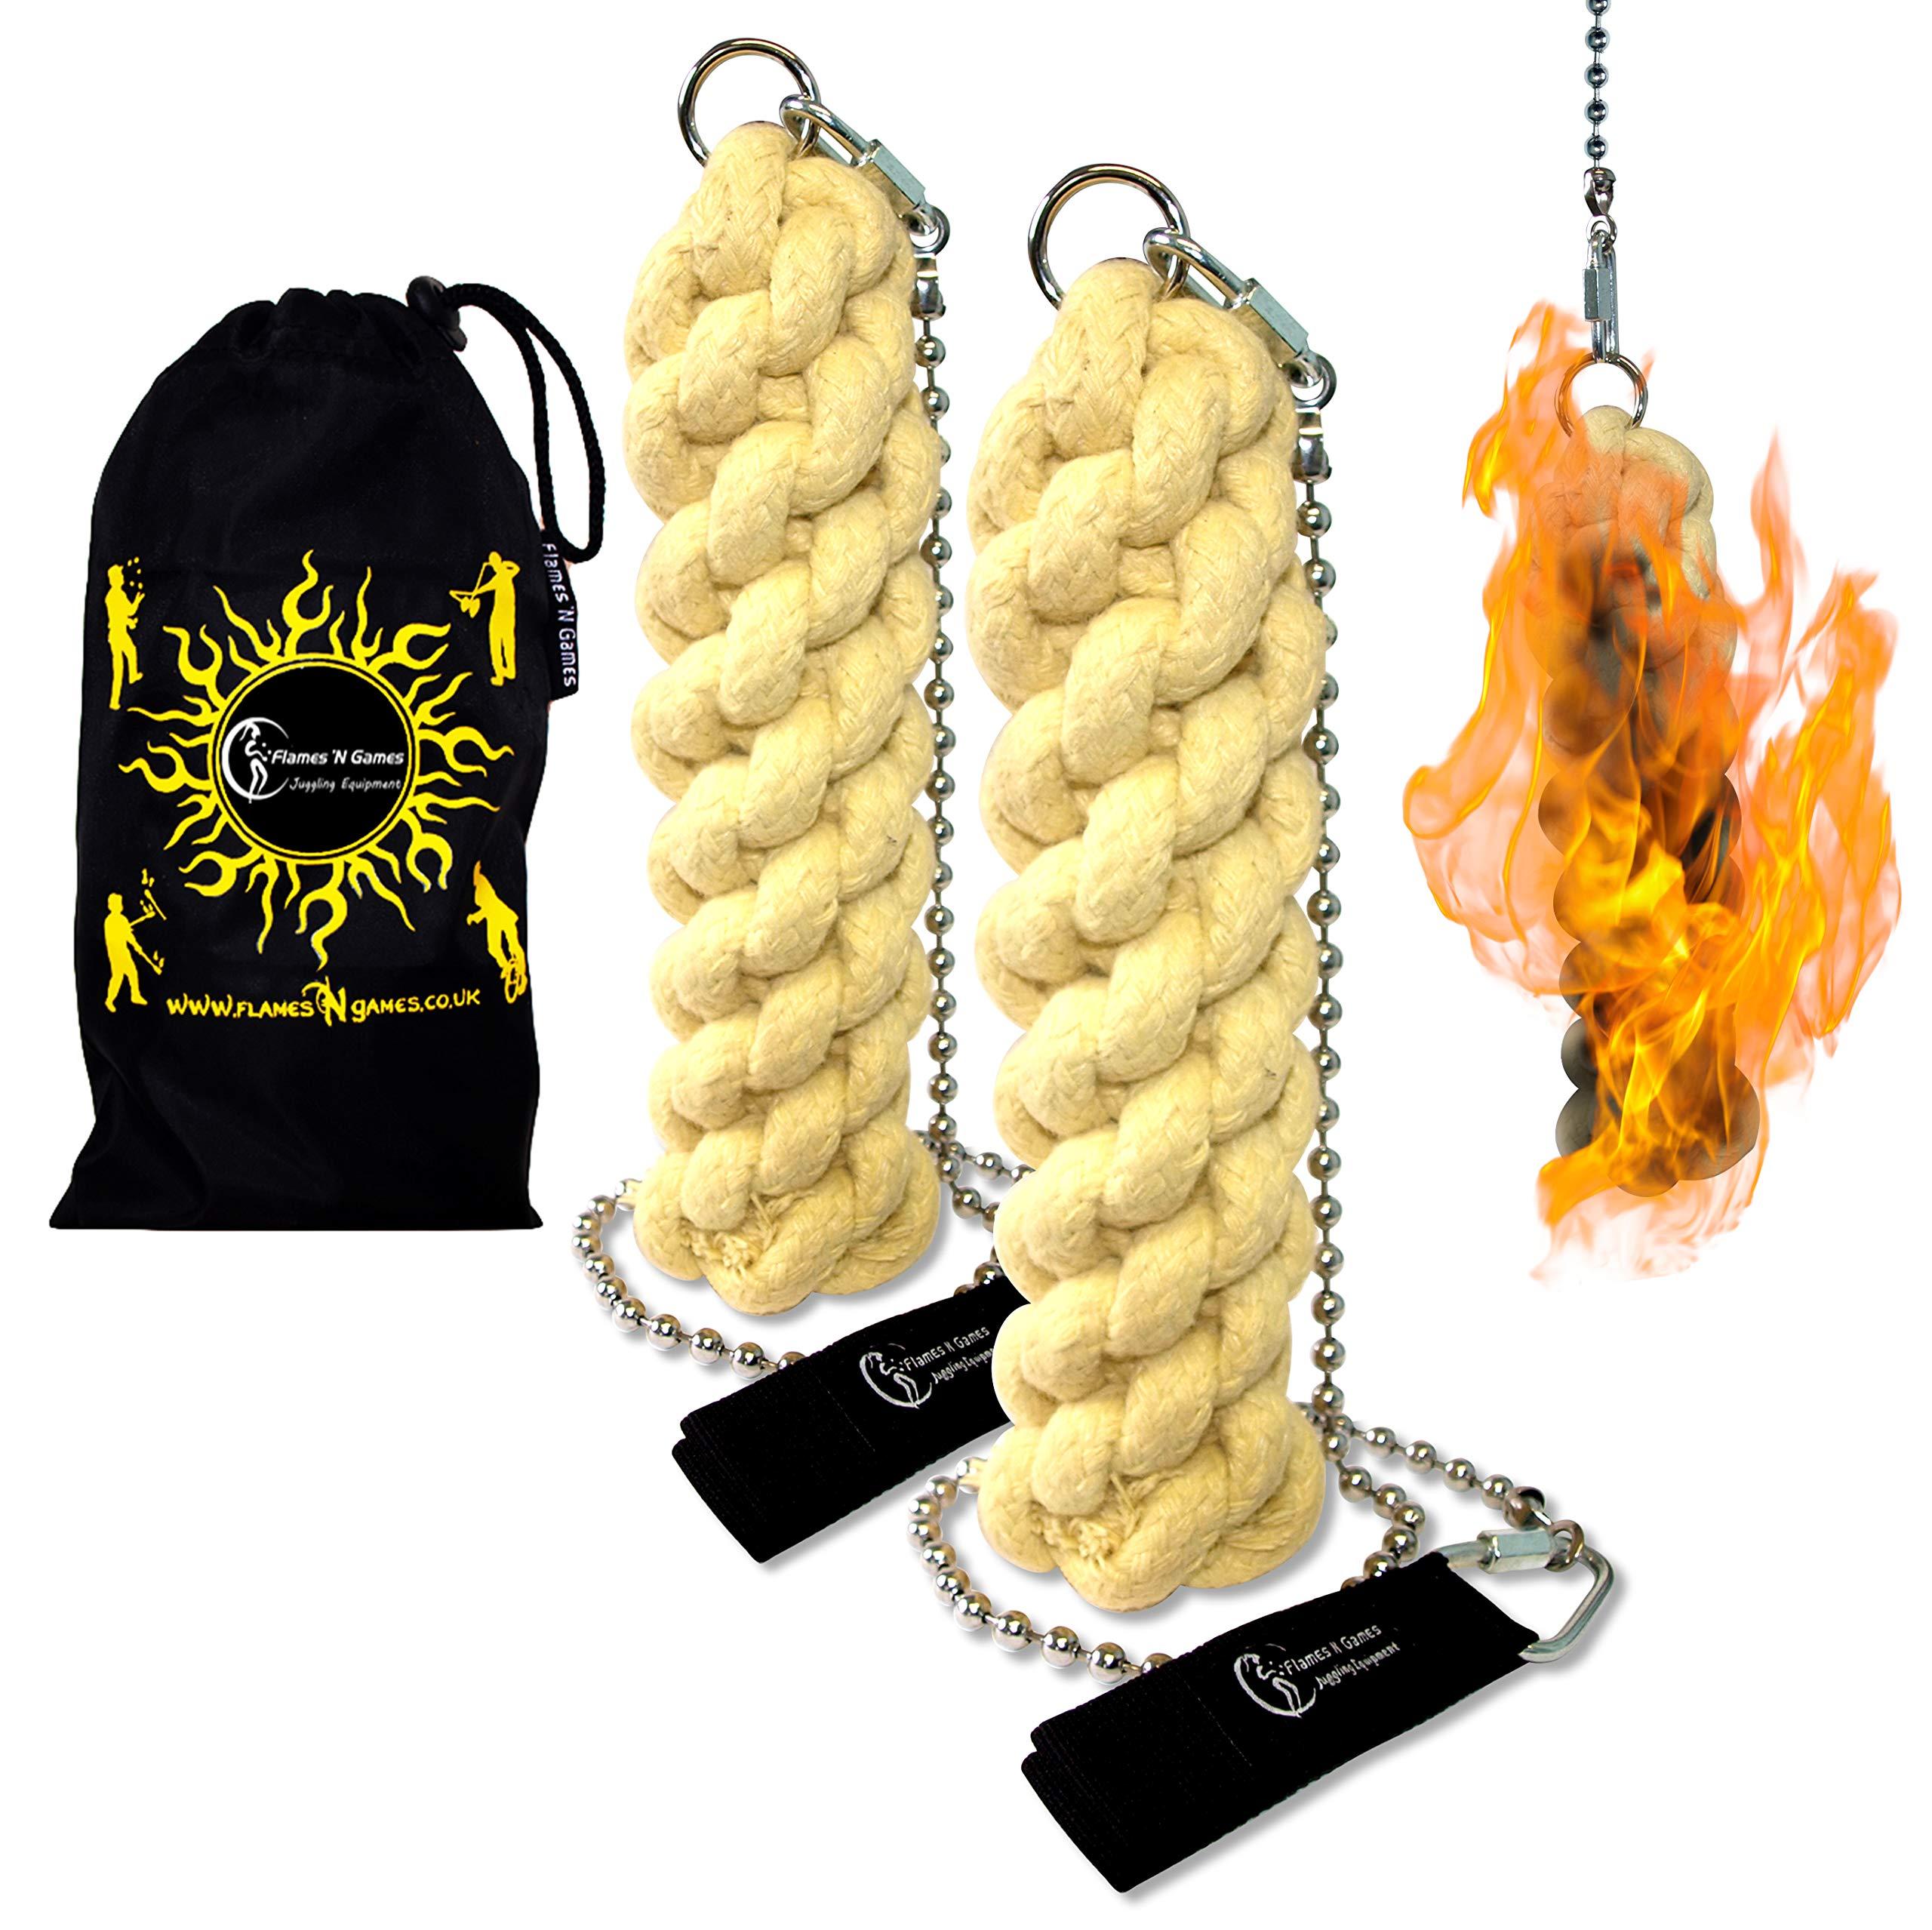 Flames N Games ORION X - Pro Fire Poi set + Flames 'N Games Travel Bag